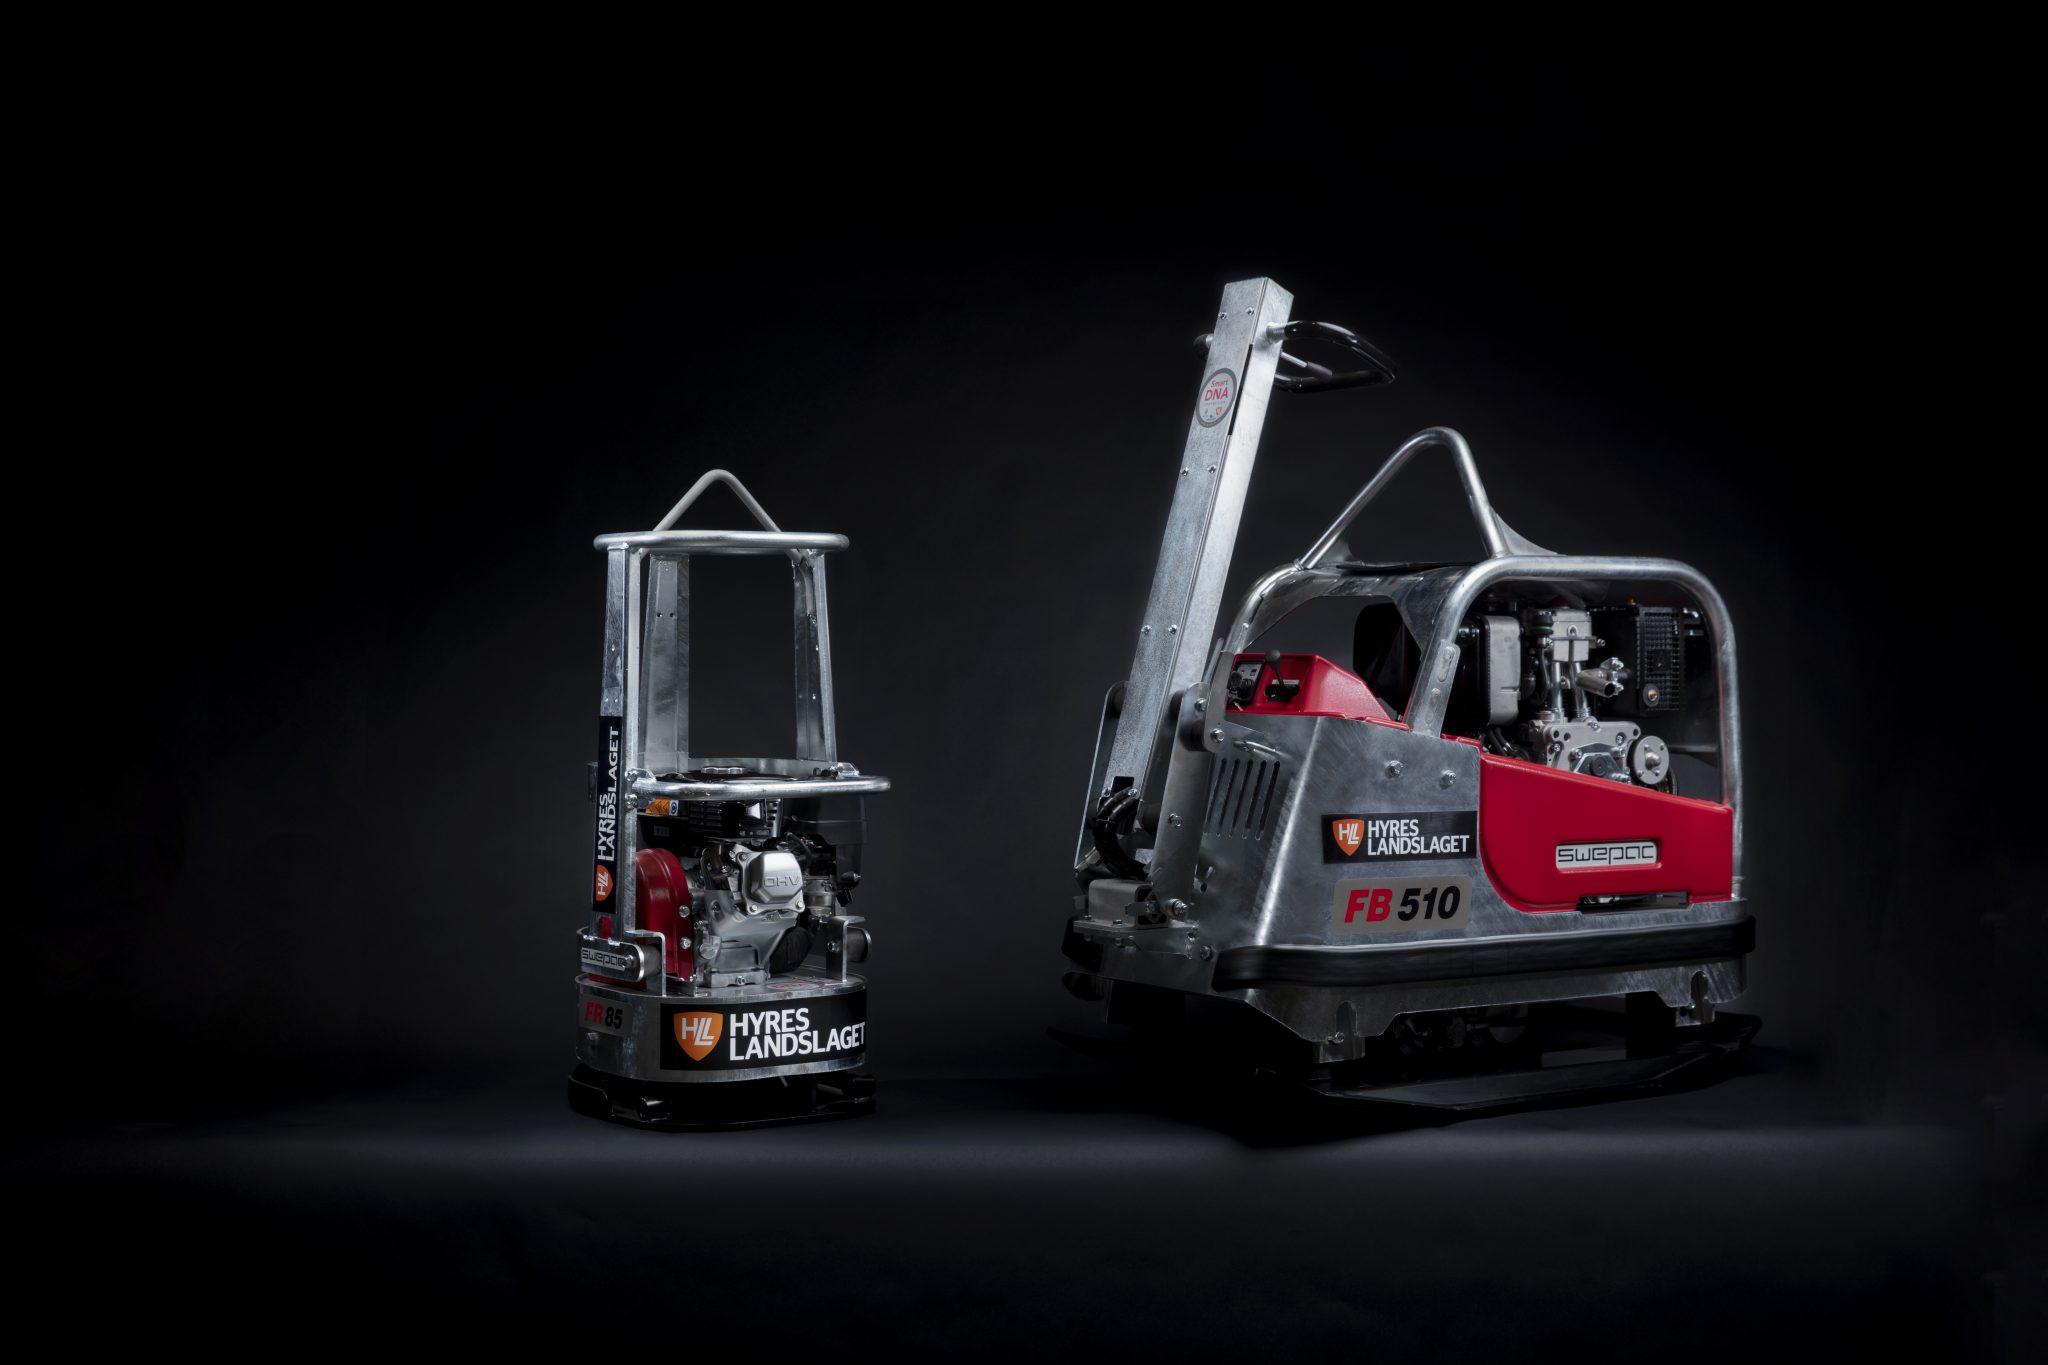 Swepac vibratorplattor, FB 510 & FR 85